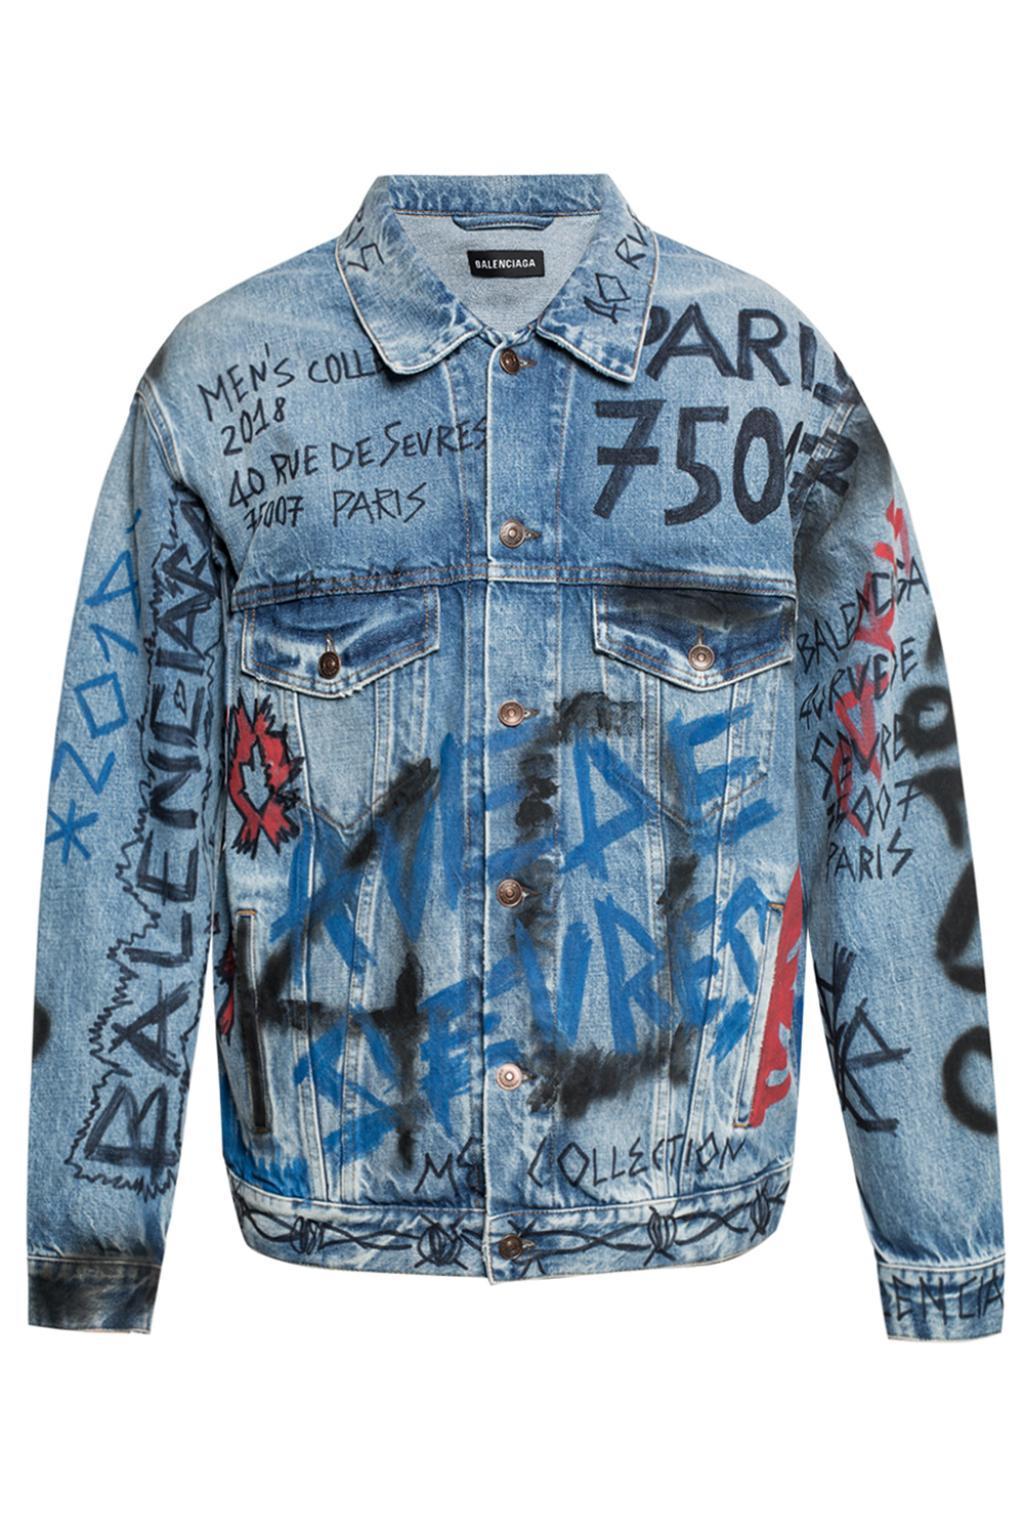 91746634b8b Lyst - Balenciaga Graffiti Denim Jacket in Blue for Men - Save 33%